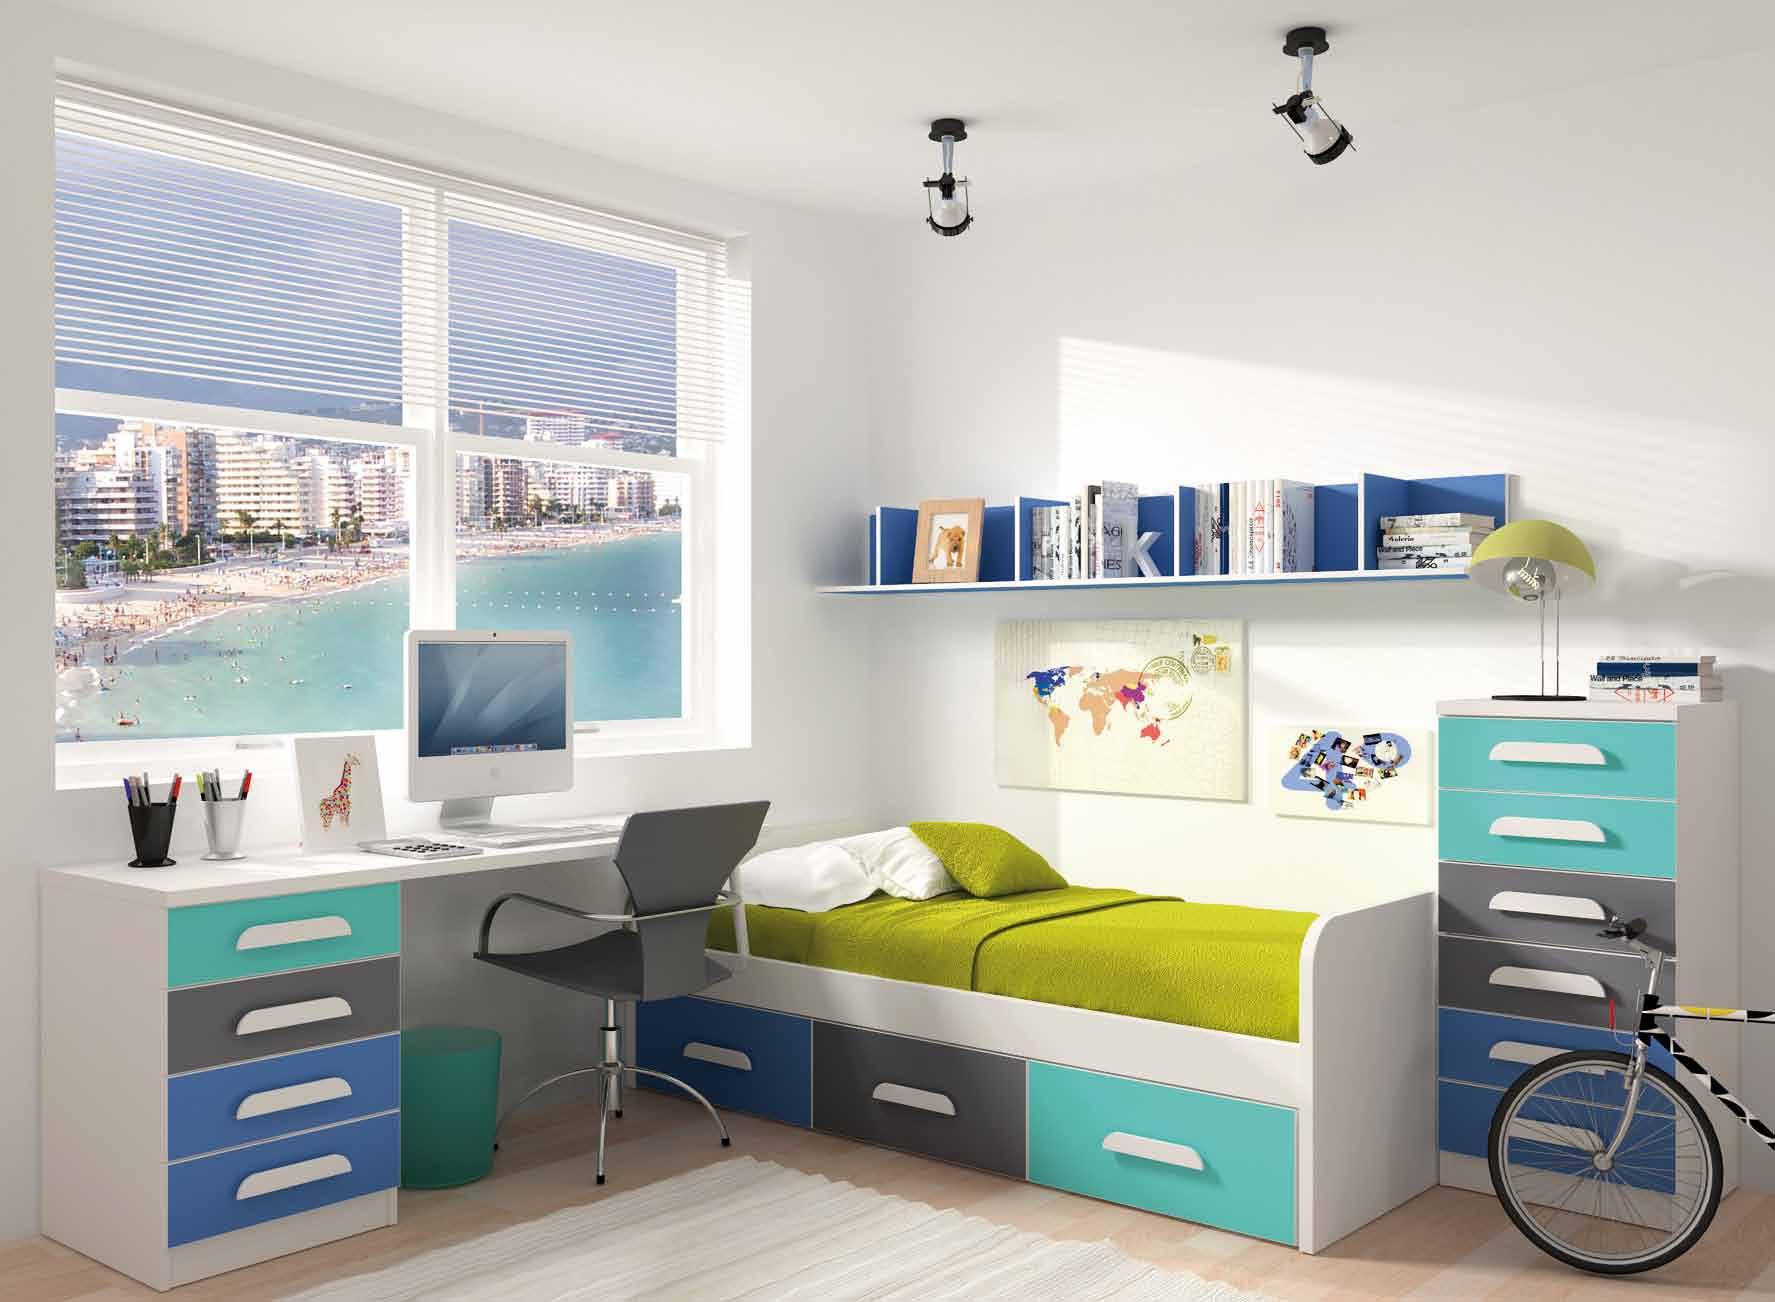 Dormitorios juveniles con cama de matrimonio affordable - Camas dormitorio juvenil ...